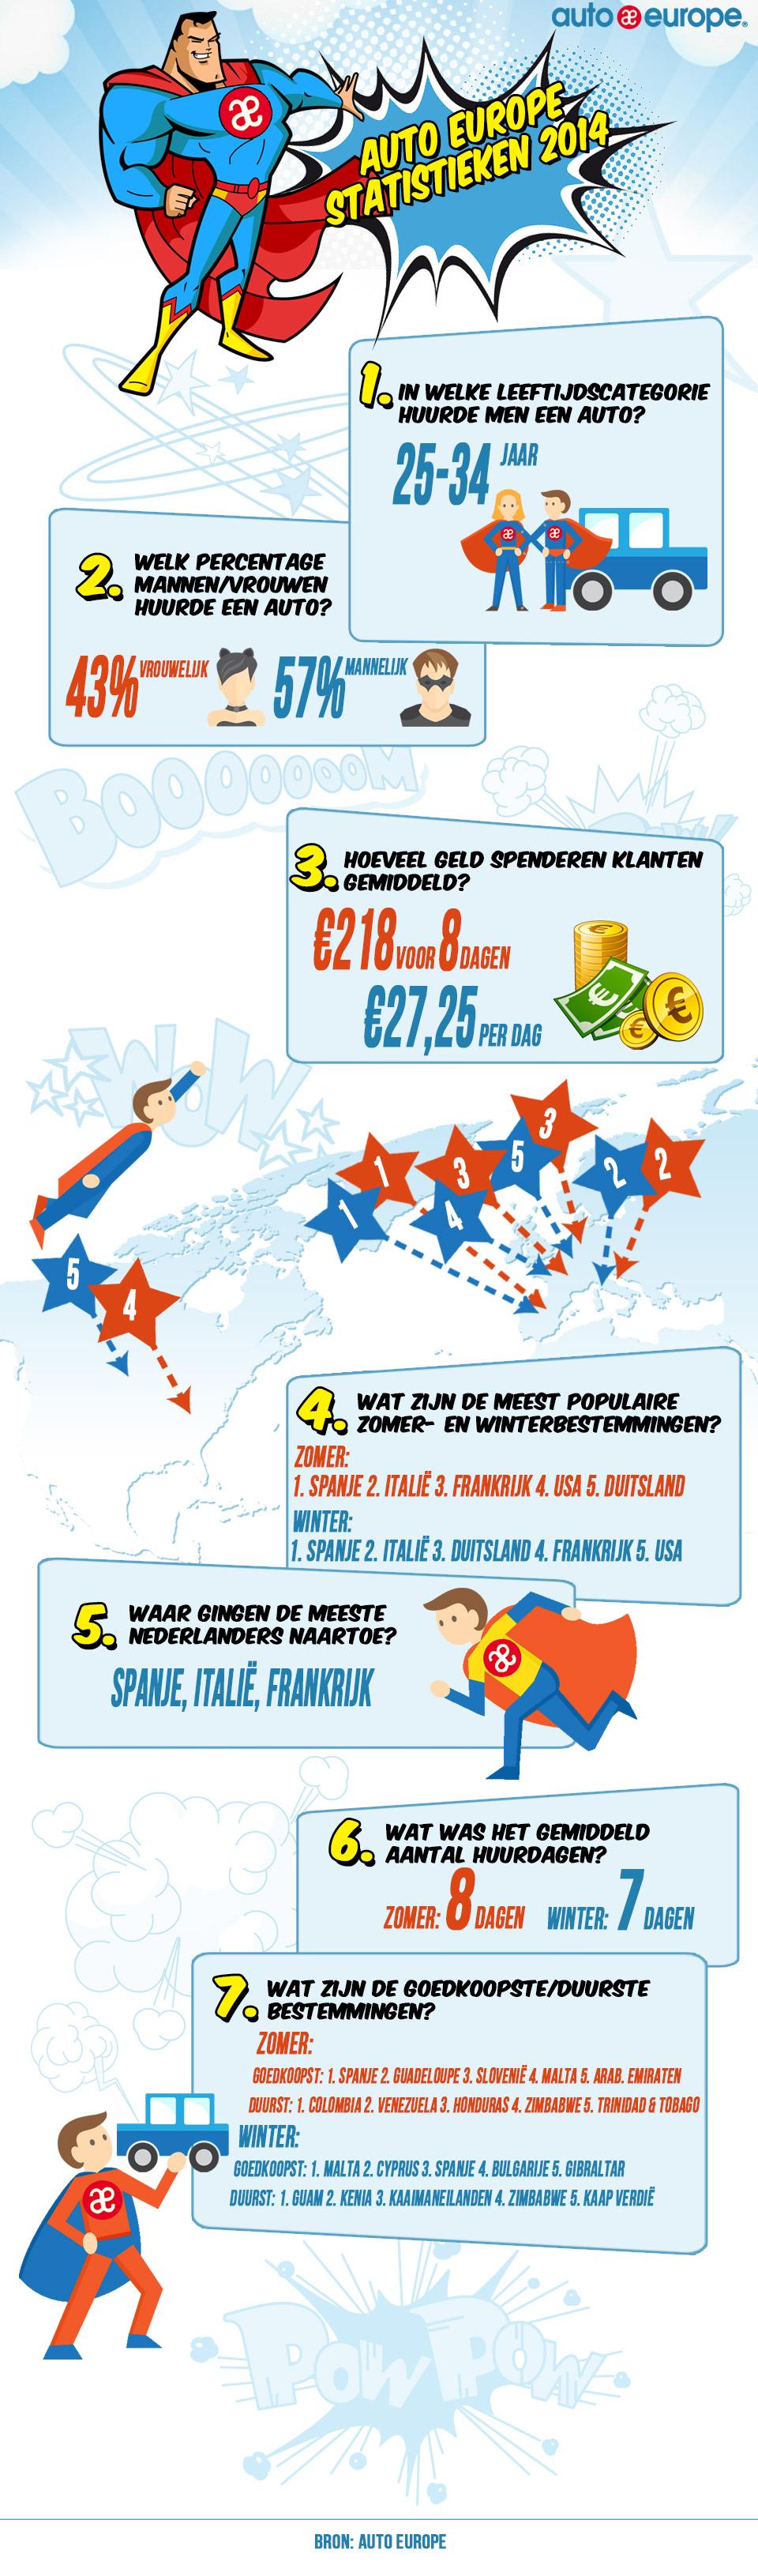 Auto Europe statistieken